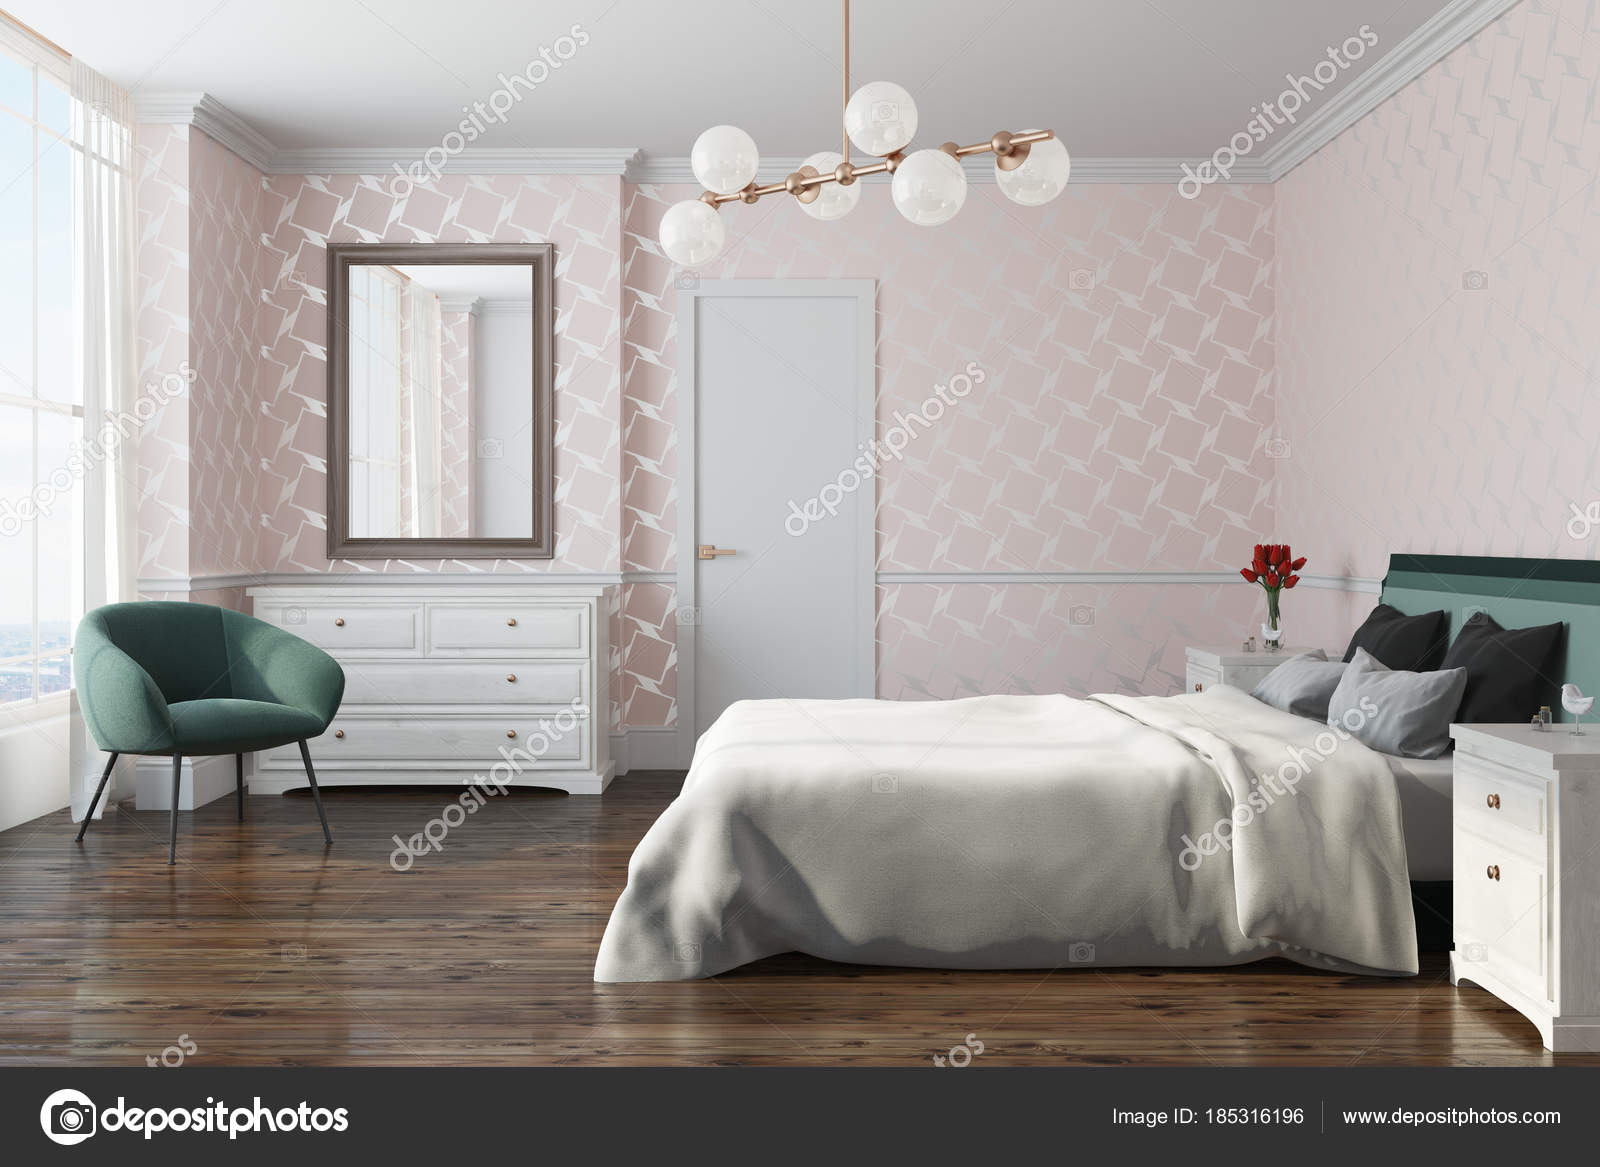 depositphotos stock photo white pattern bedroom armchair side